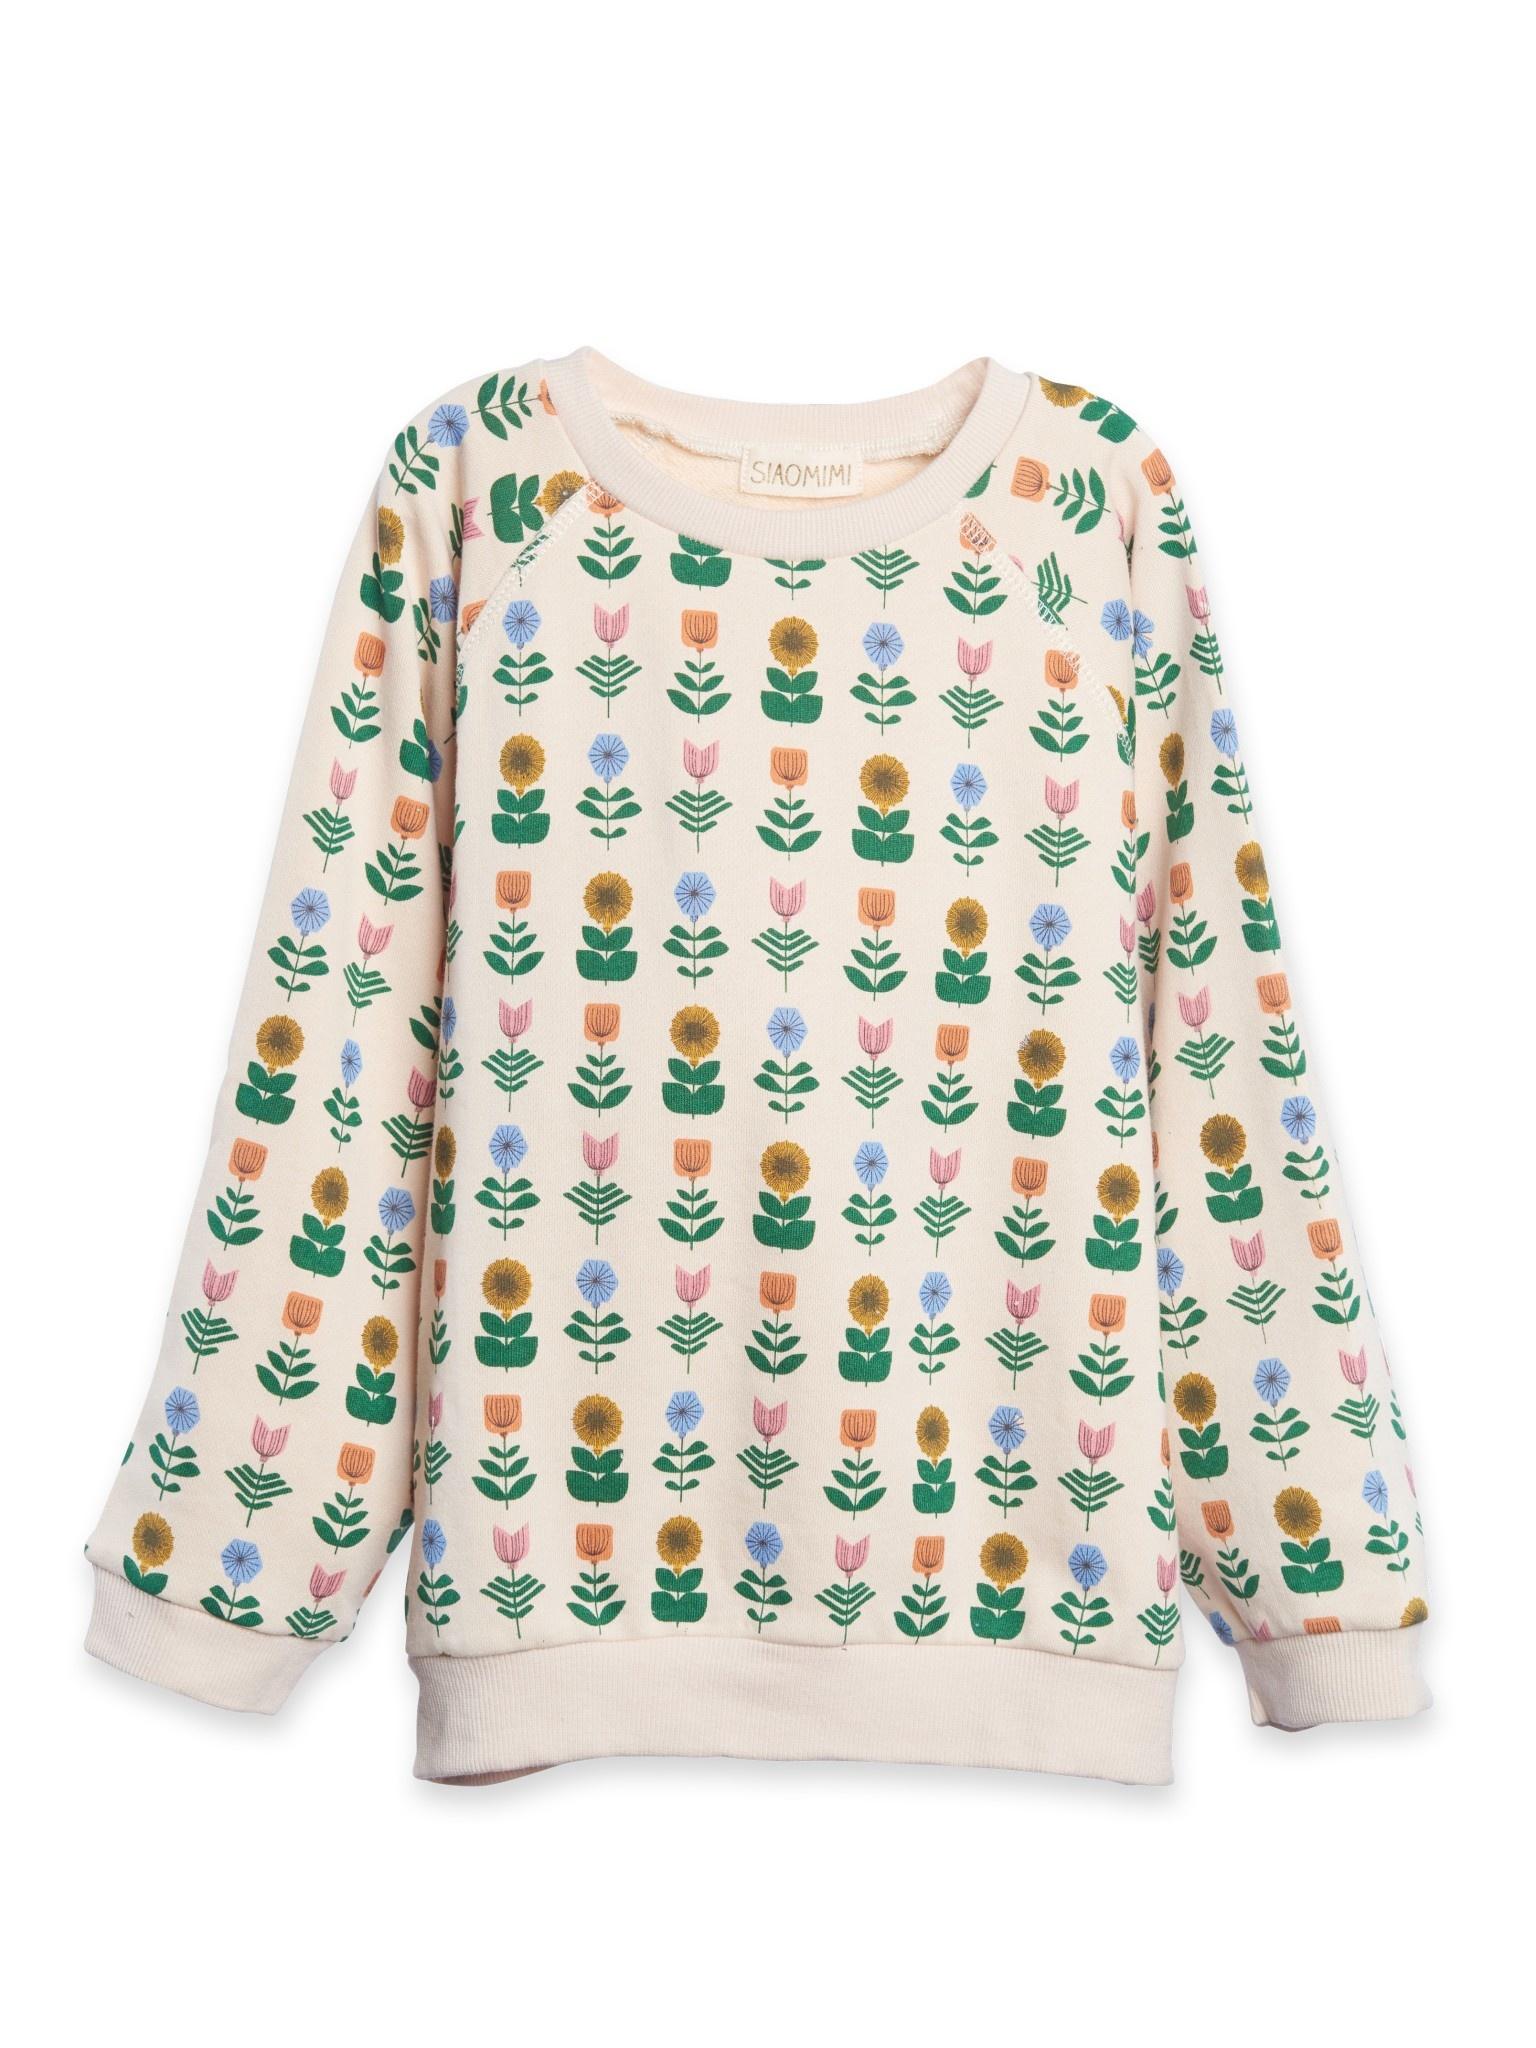 Siaomimi Floral Sweatshirt